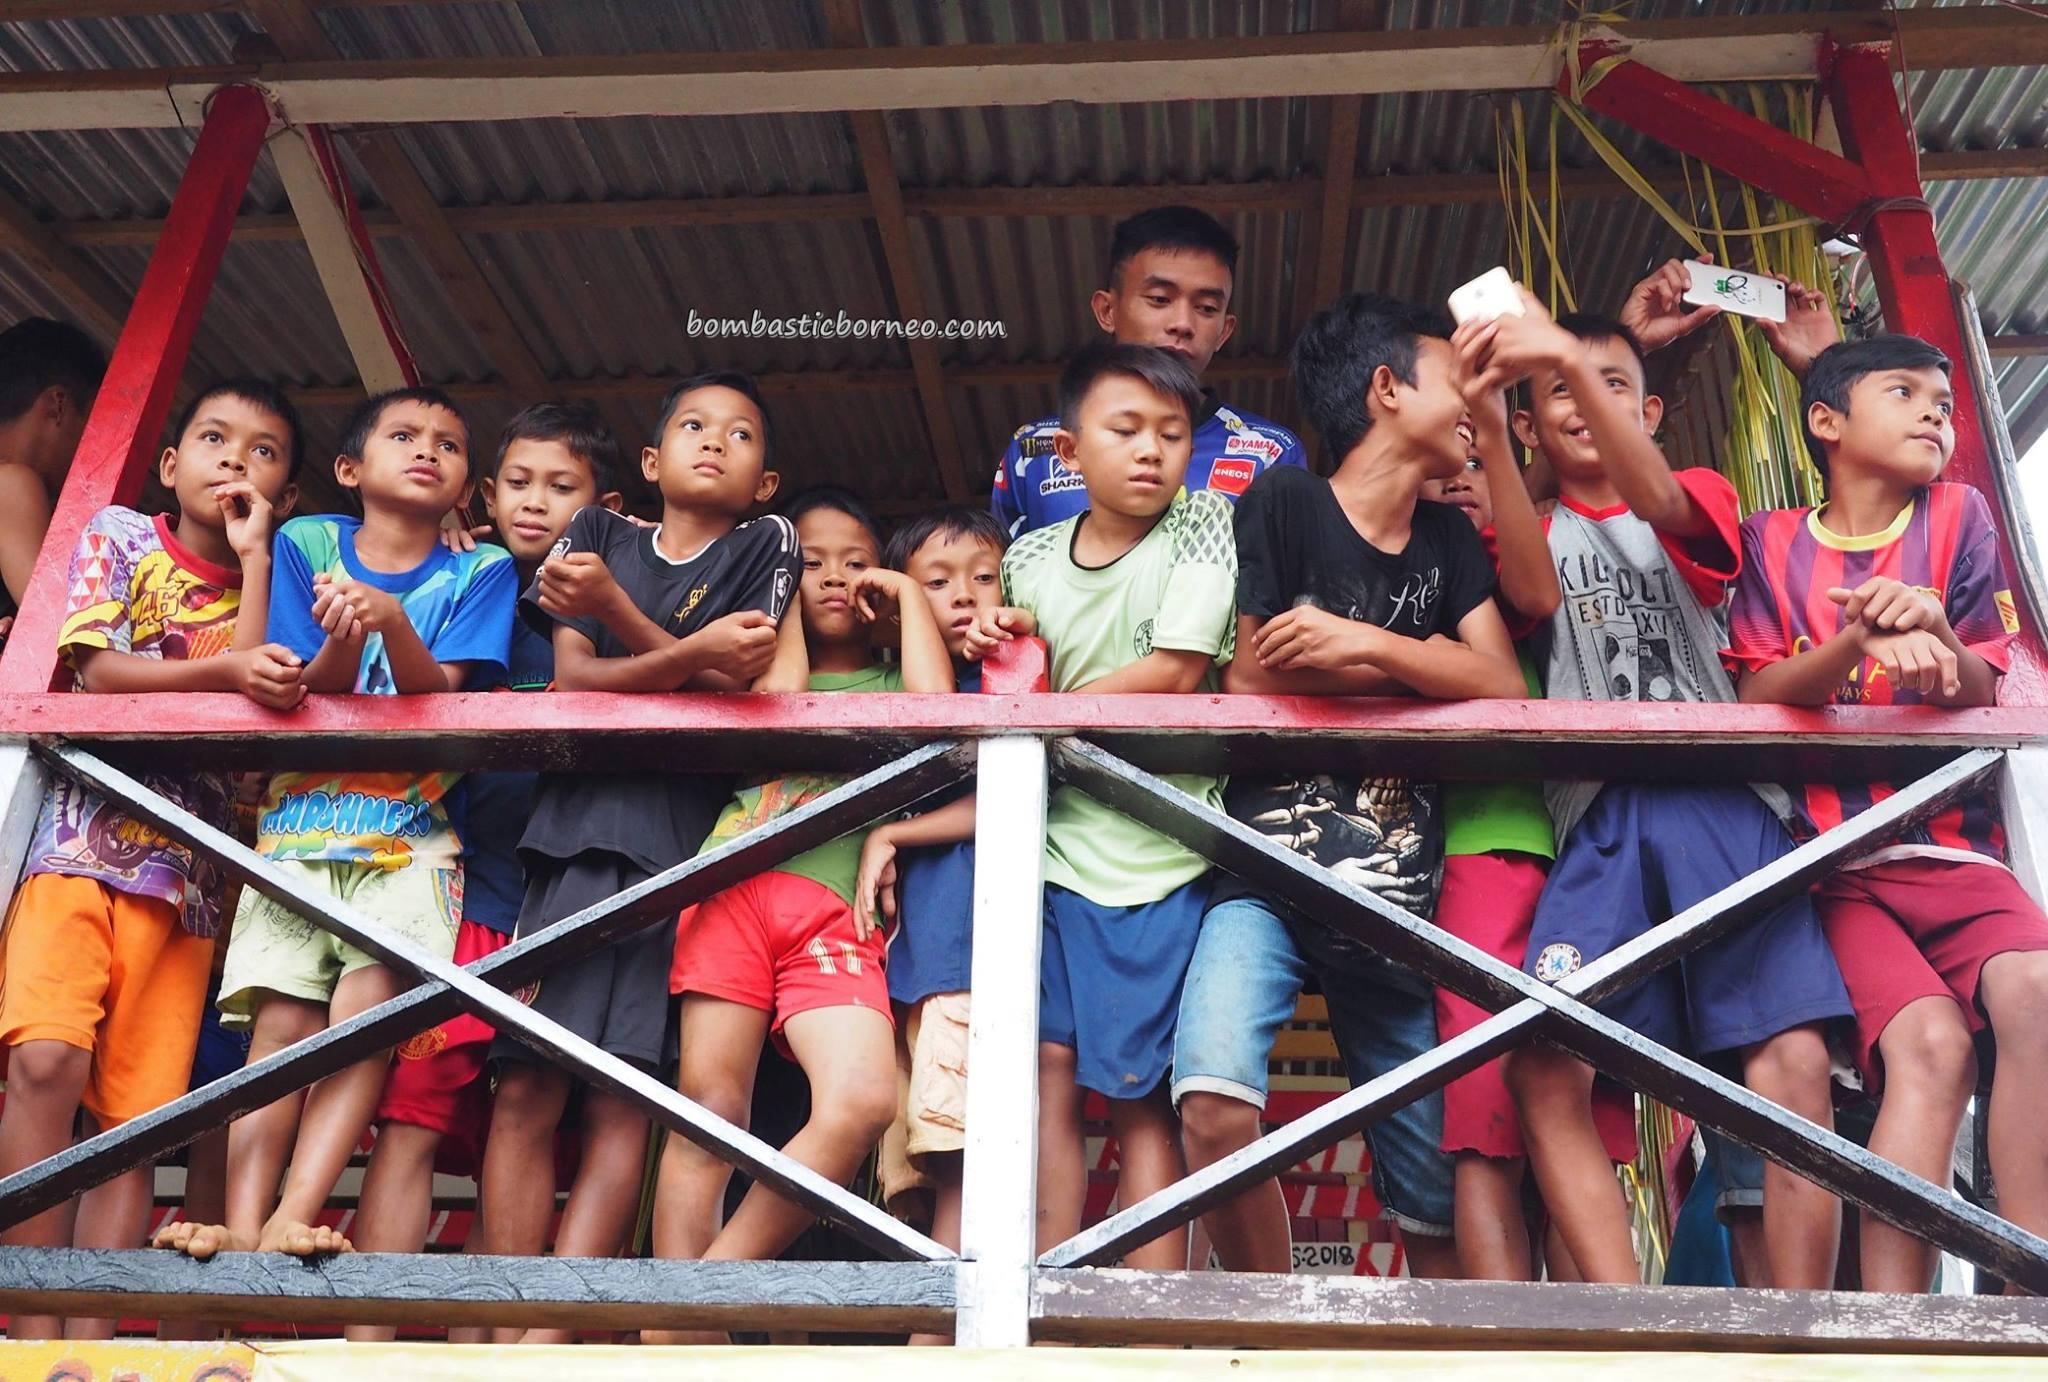 Gawai Dayak, thanksgiving, indigenous, traditional, culture, event, backpackers, Indonesia, Desa Bengkilu, Sanggau Ledo, tribe, wisata budaya, Tourism, travel guide, 印尼西加里曼丹, 土著部落